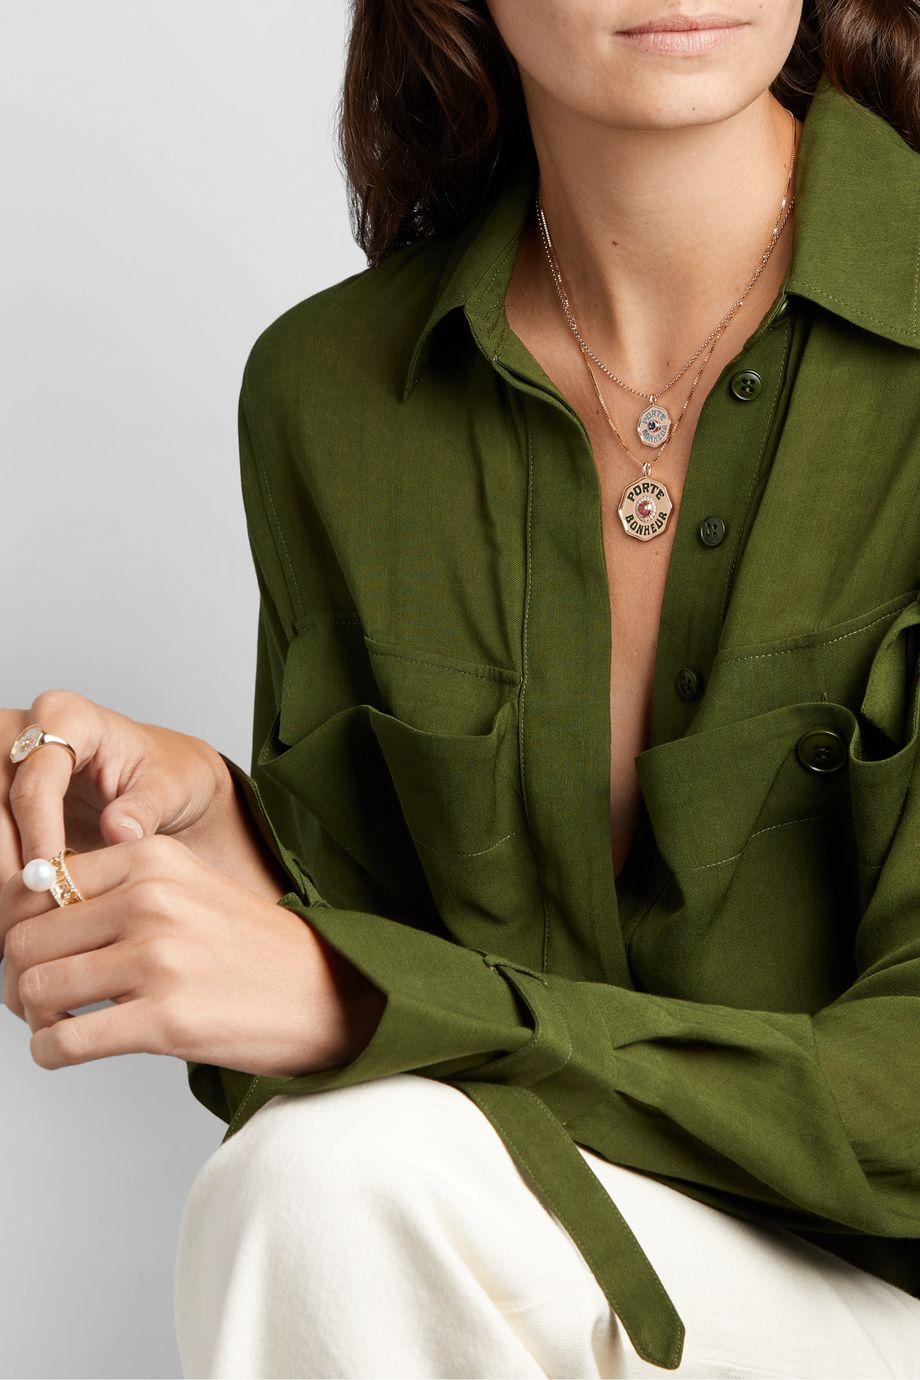 Marlo Laz Coin 14-karat gold, enamel, tourmaline and diamond necklace